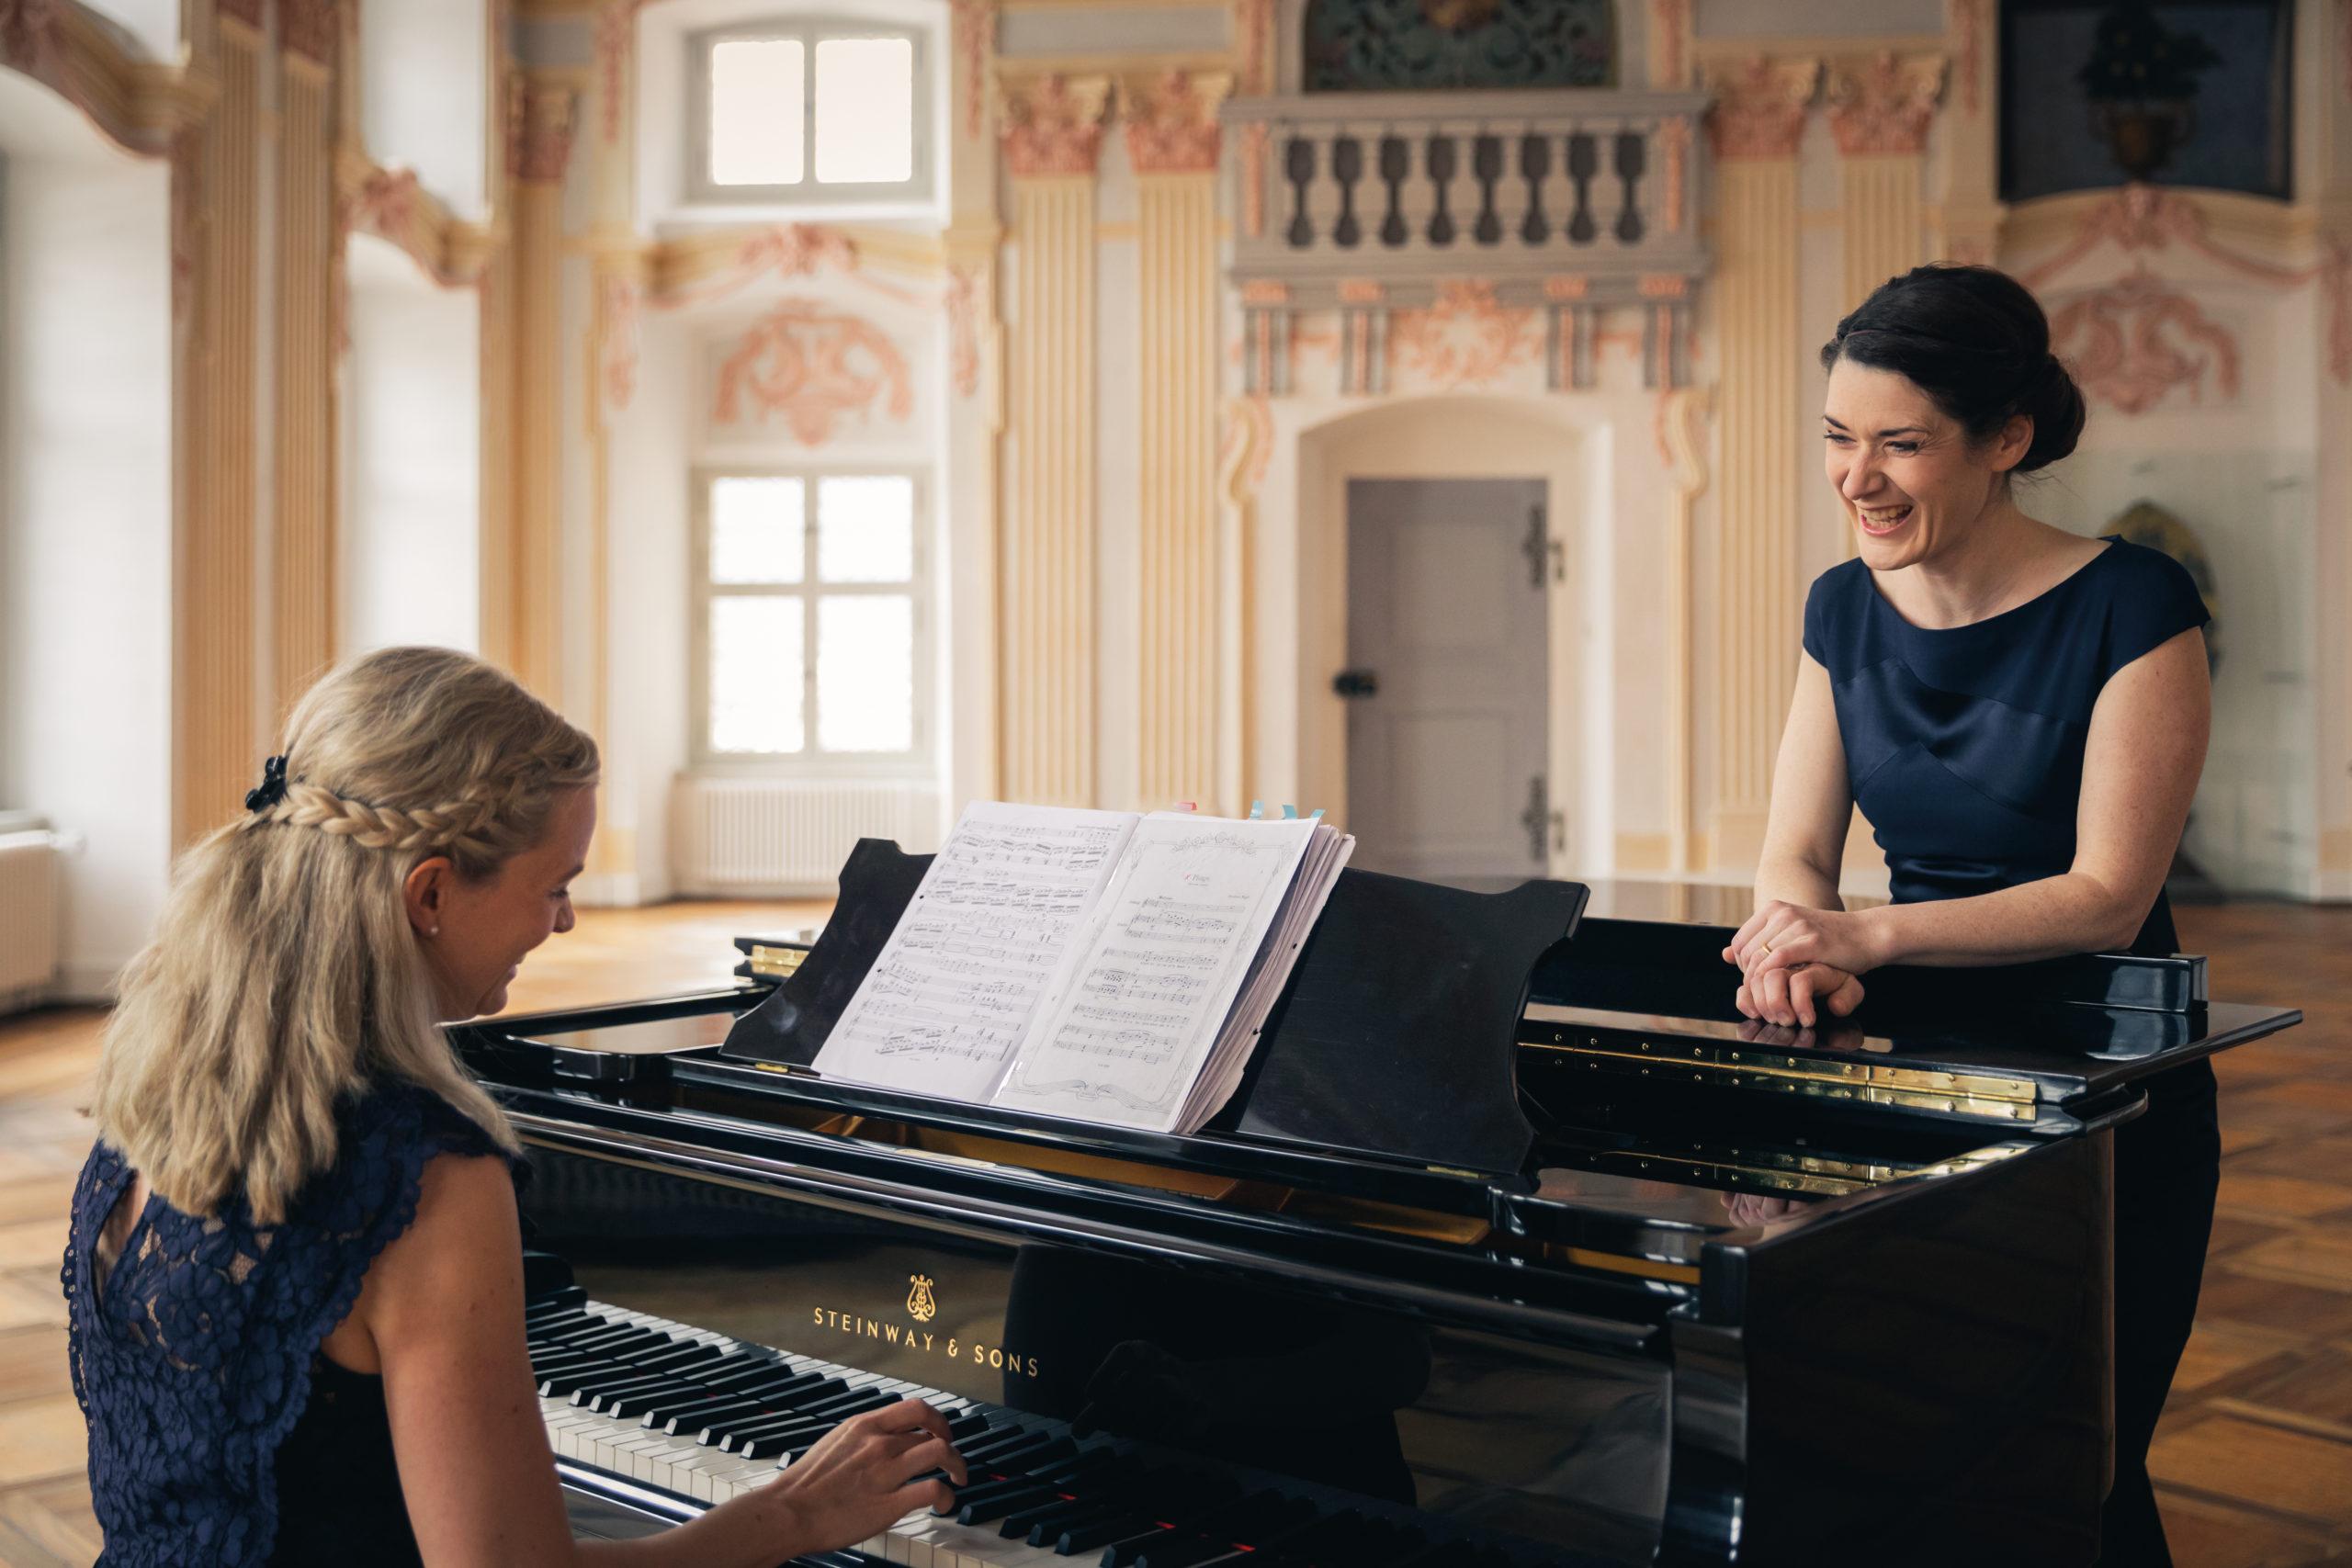 Sybille Diethelm & Fabienne Romer